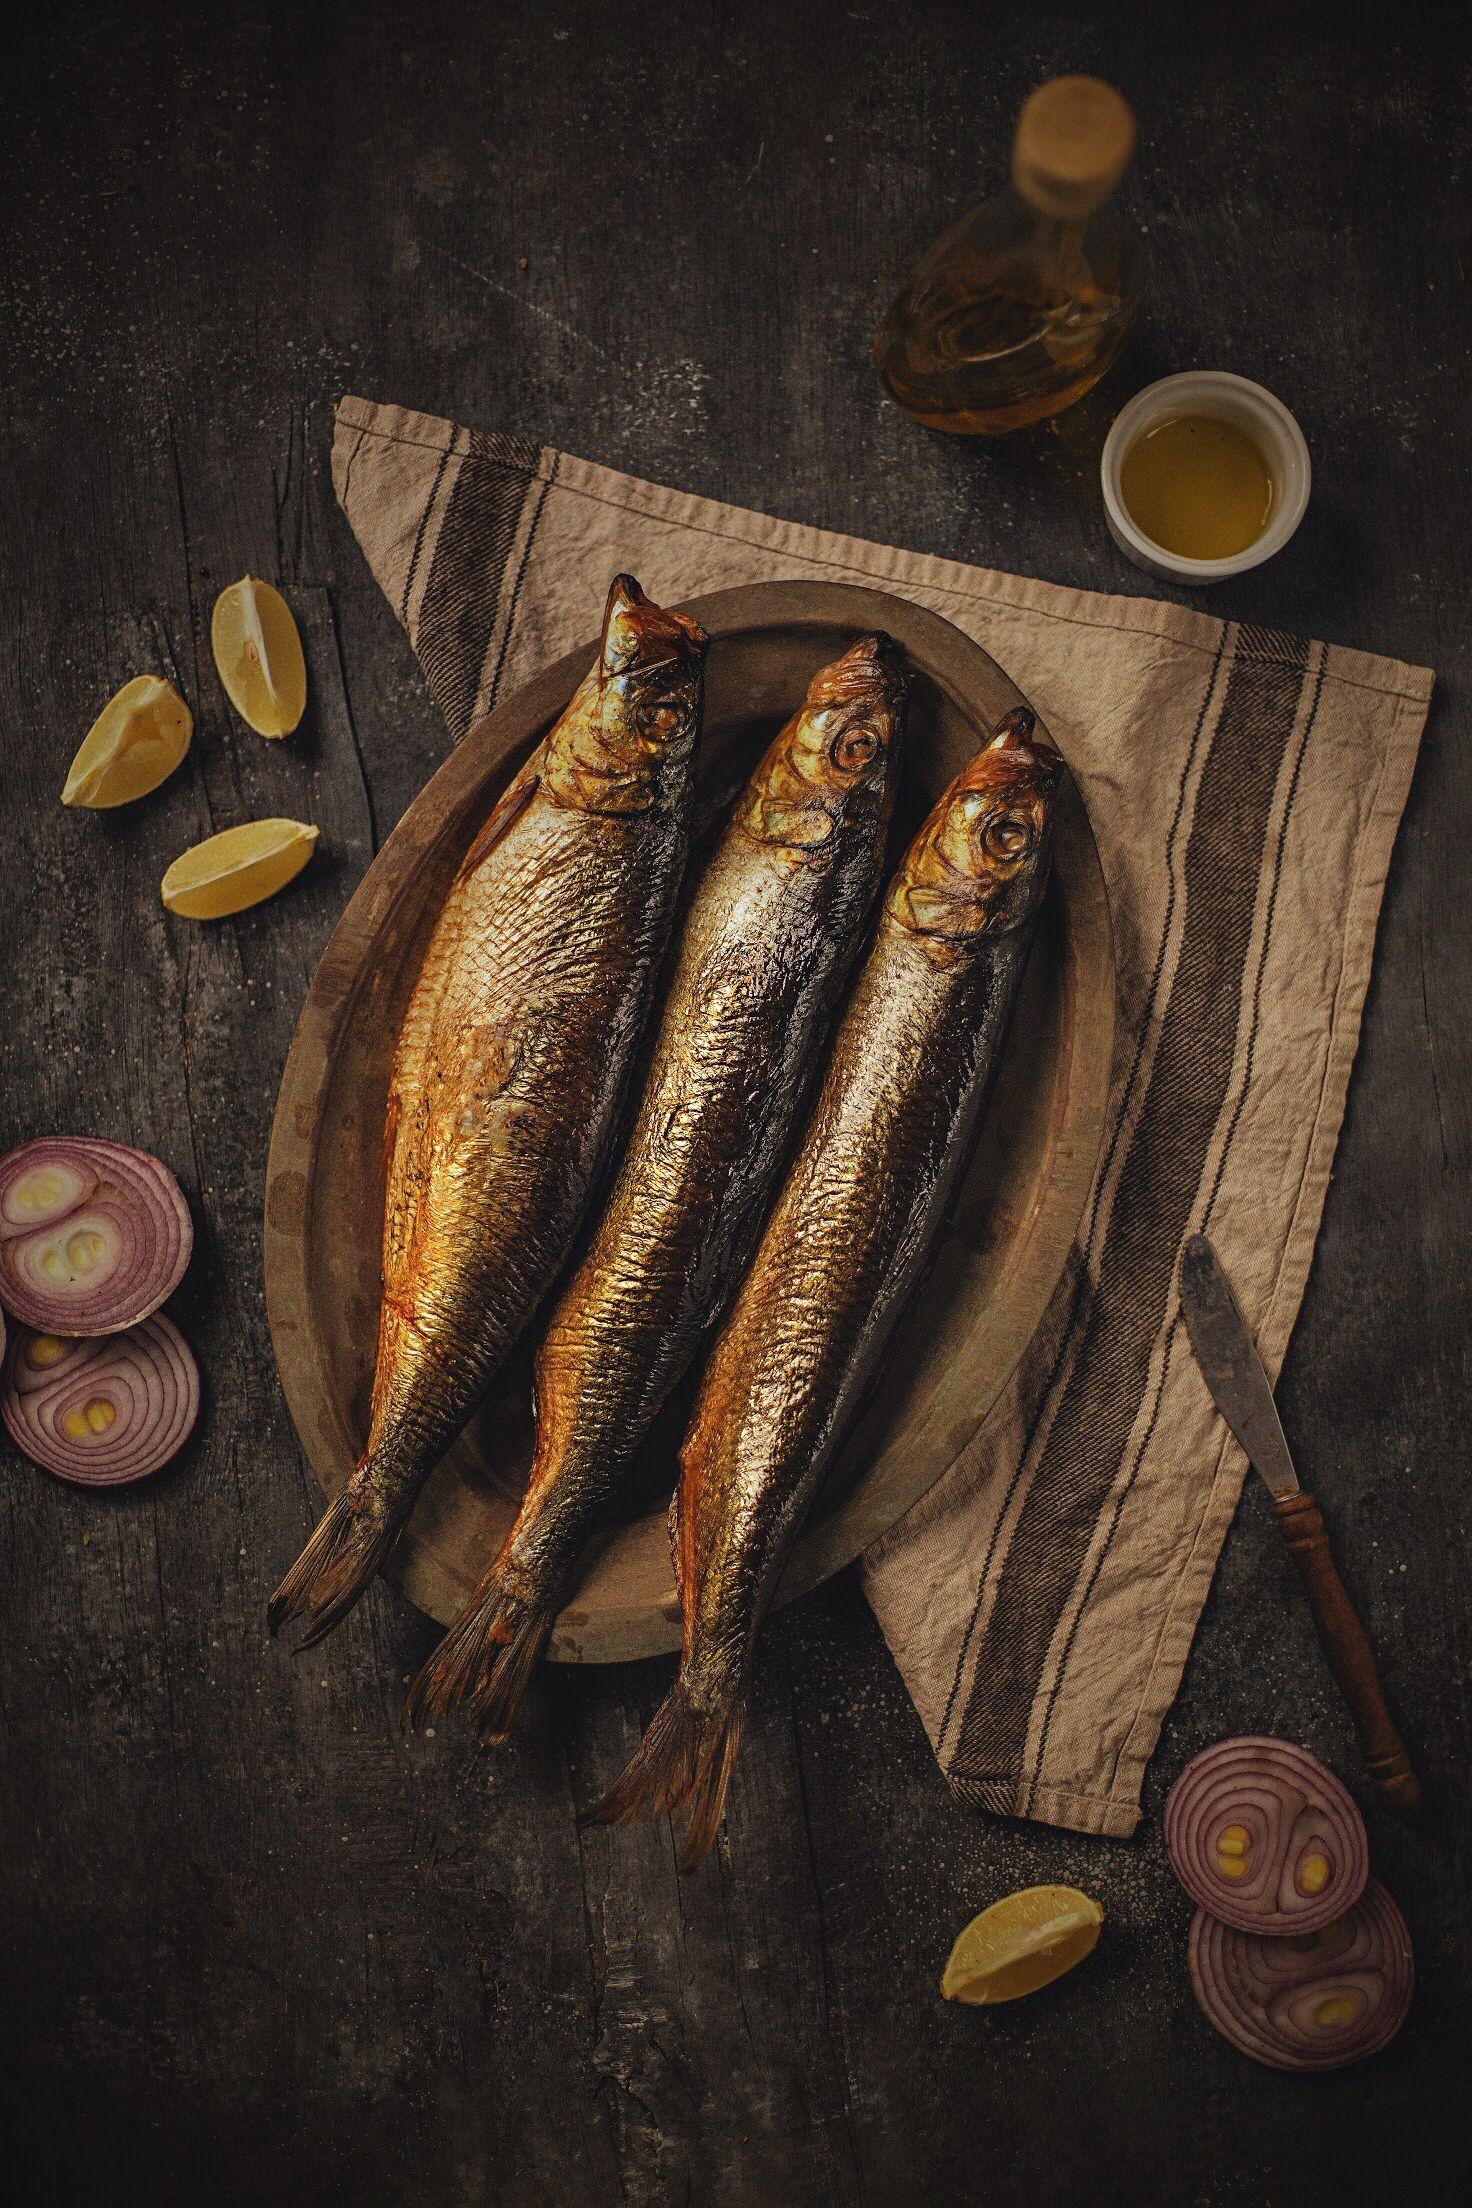 Fish Food Photography Mackerel Fish Egyptian Dish Sham Elneeseem شم النسيم رنجه Egyptian Food Fish Food Photography Food